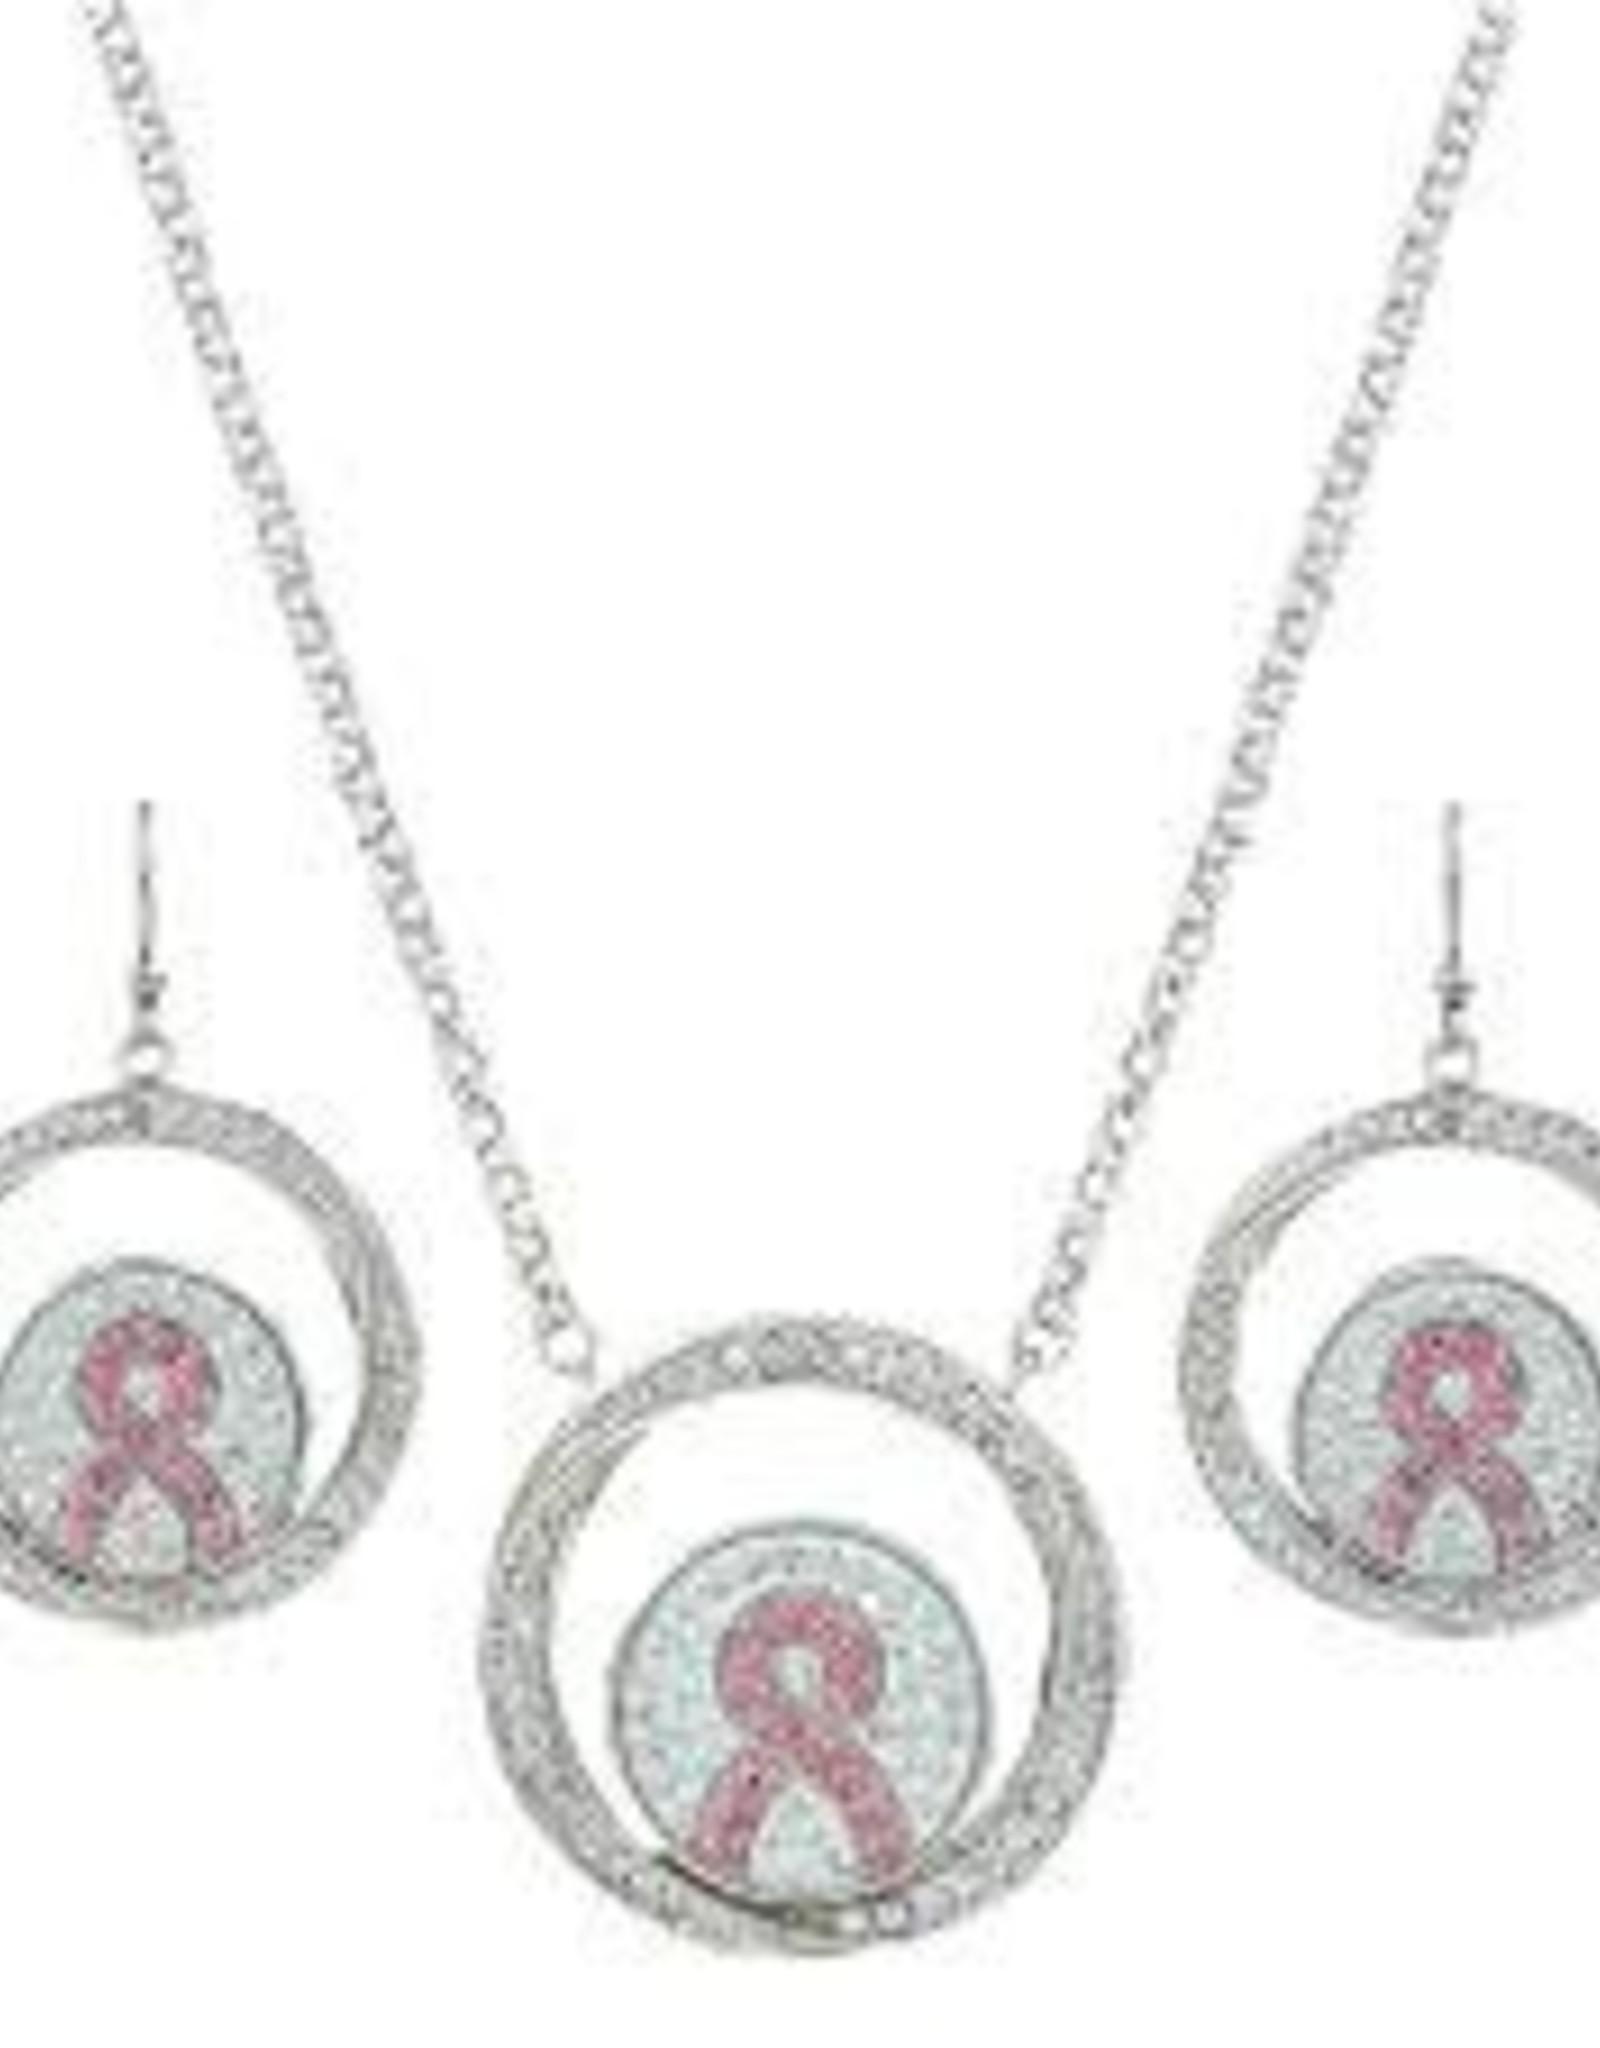 Montana Silversmiths TETWP Hope Rope Enfolded Jewellery Set